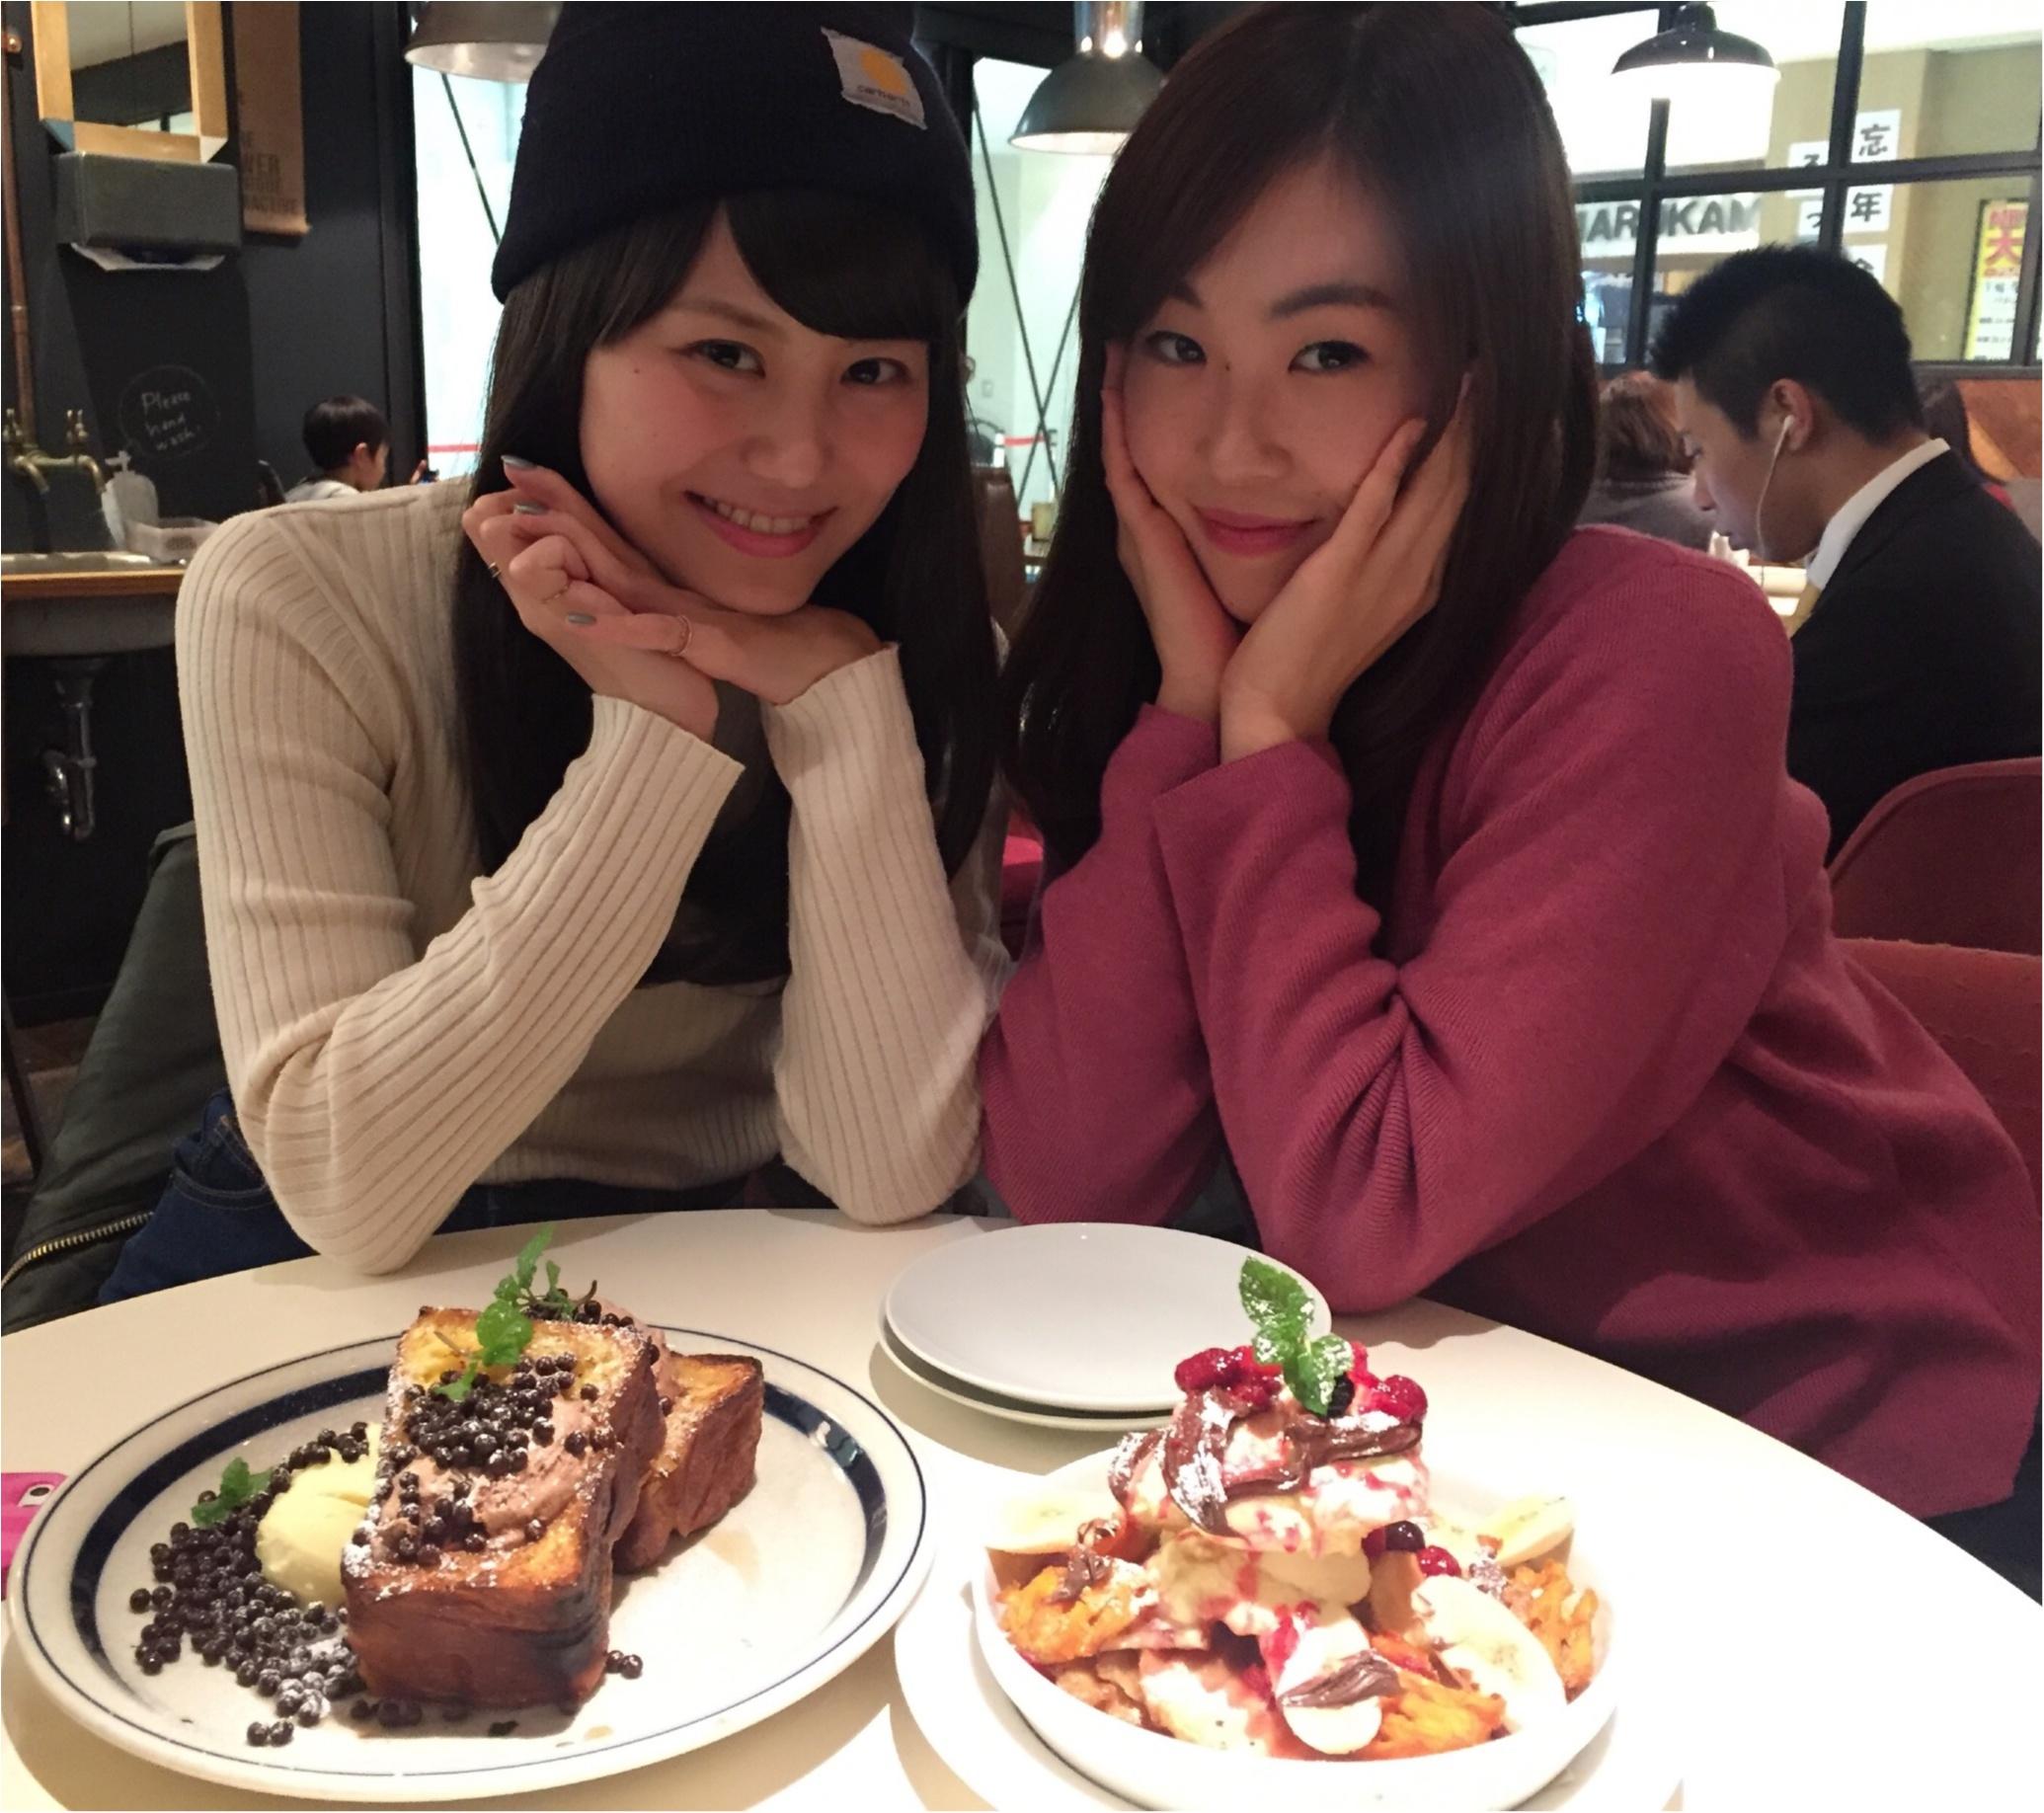 【FOOD】1000円以下でいいんですか?!絶品♥︎WIRED CAFEのフレンチトースト_5